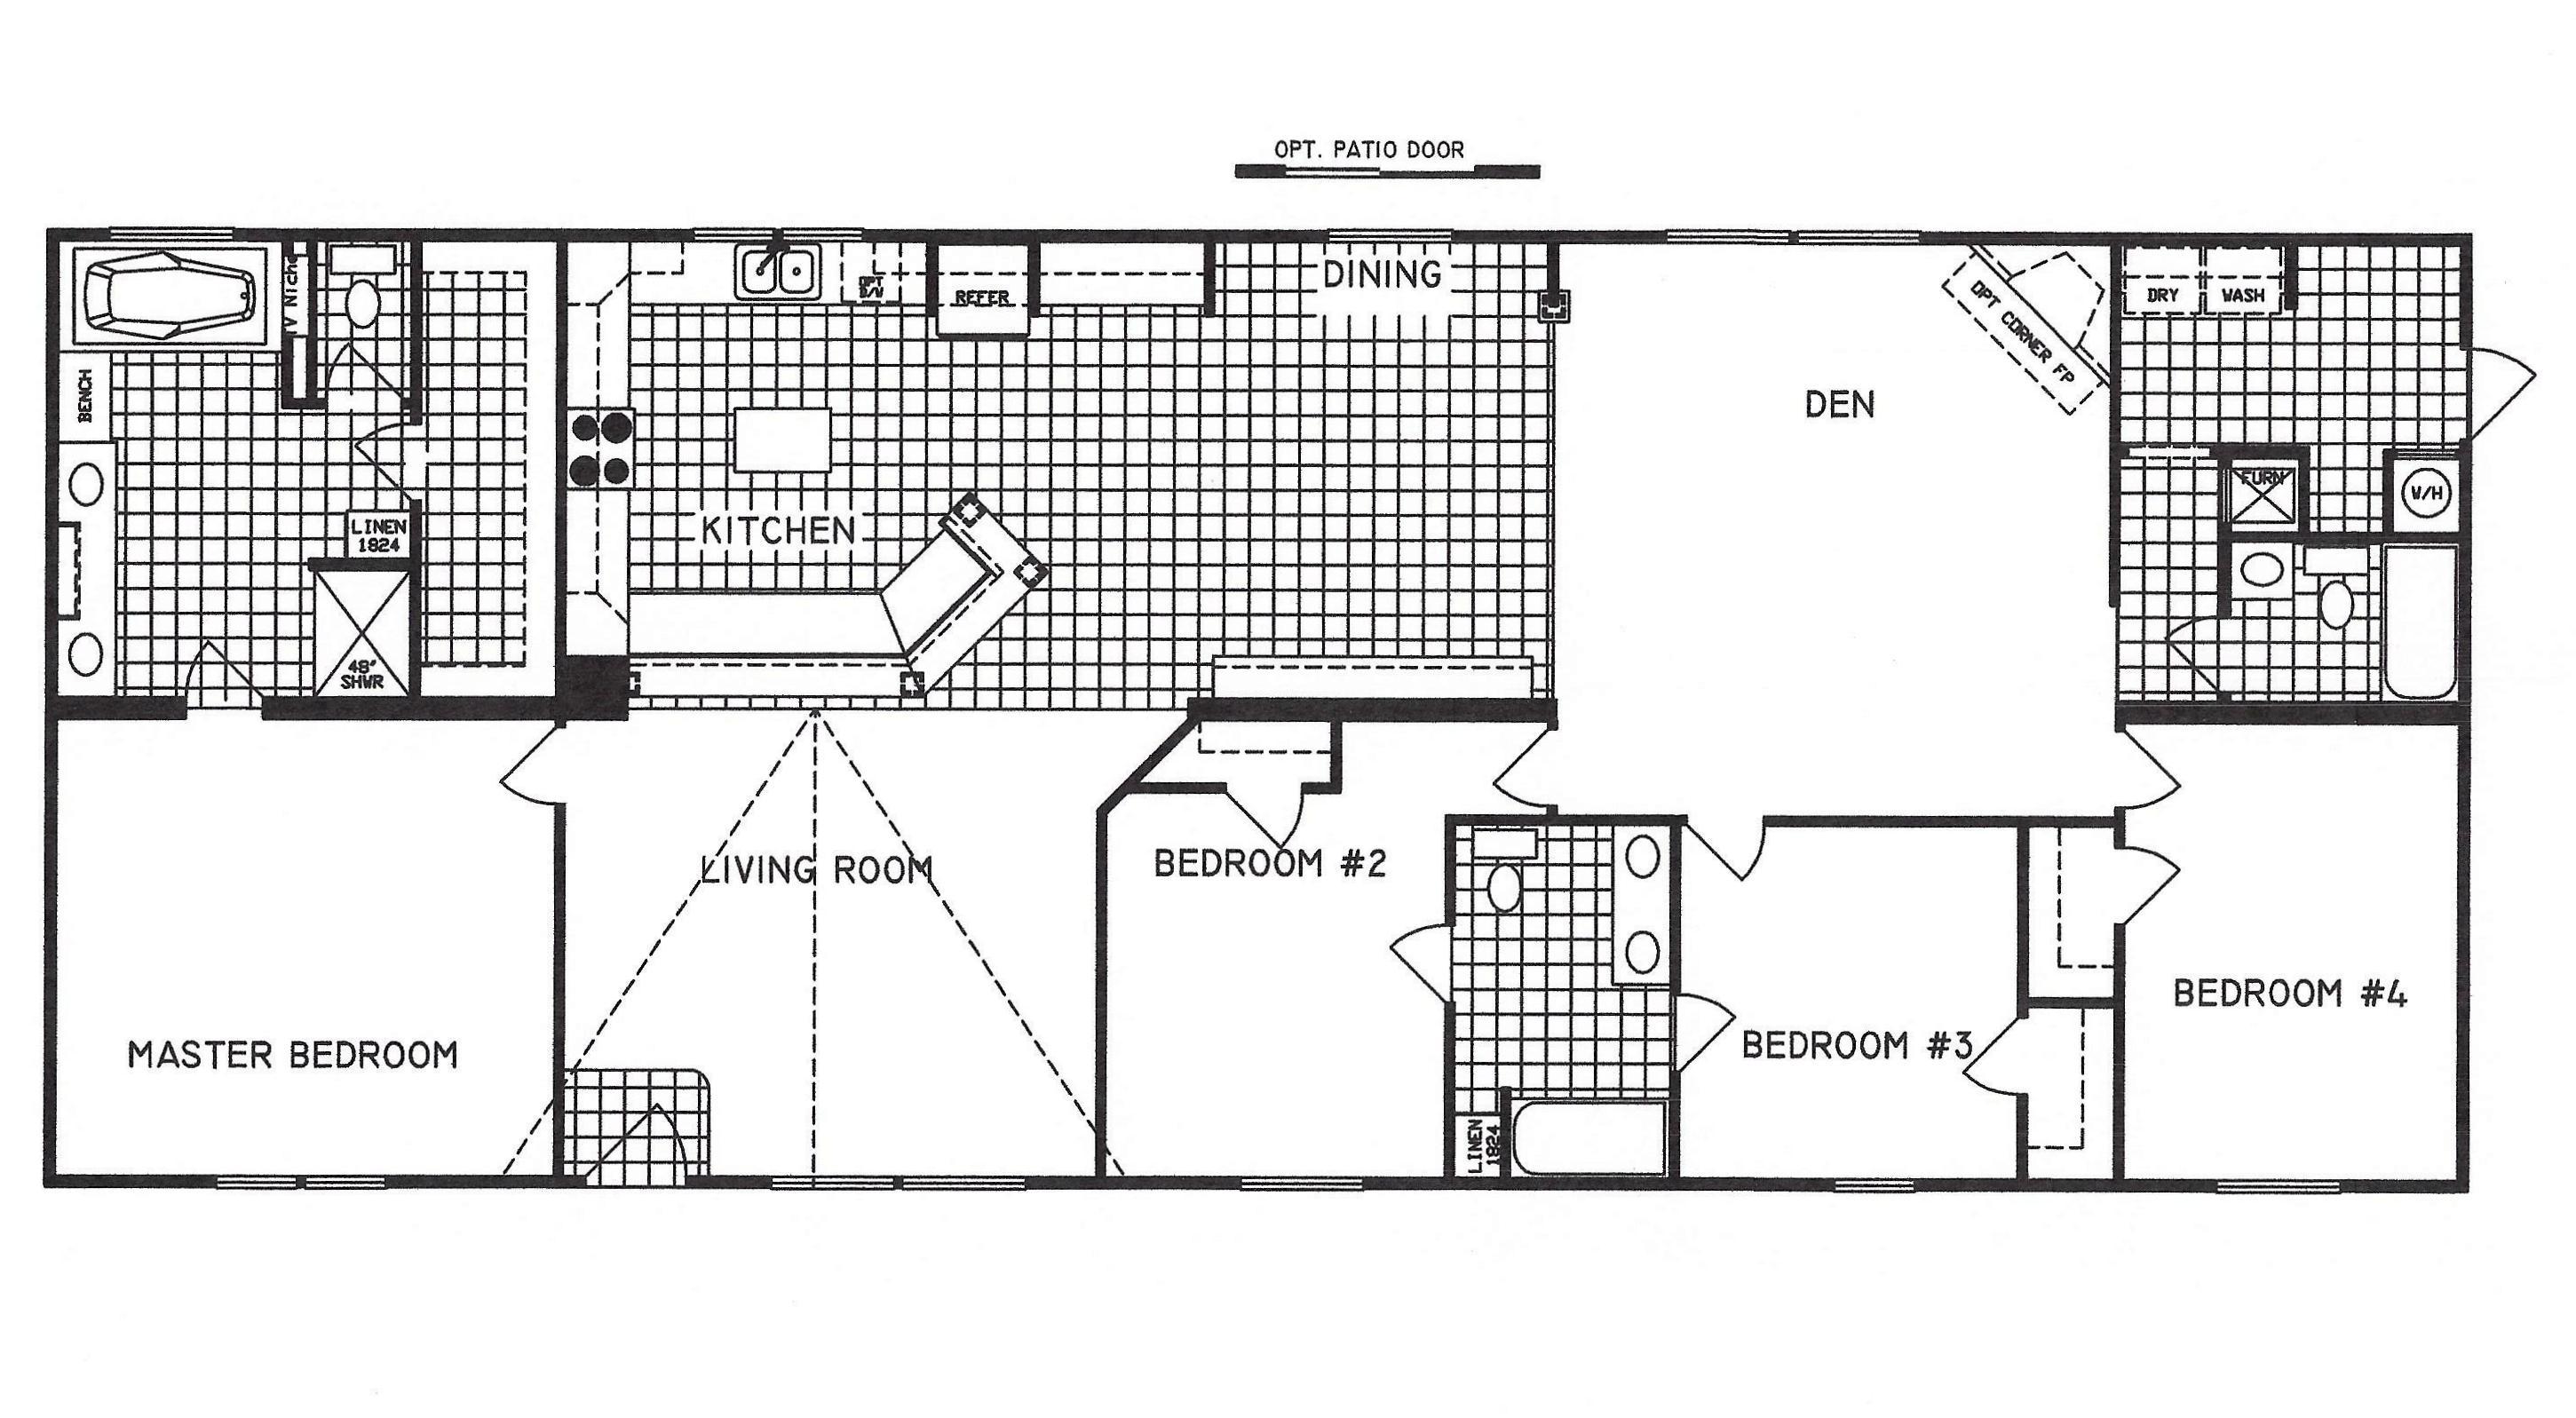 4 bedroom floor plan c 9916 hawks homes manufactured for Arkansas house plans